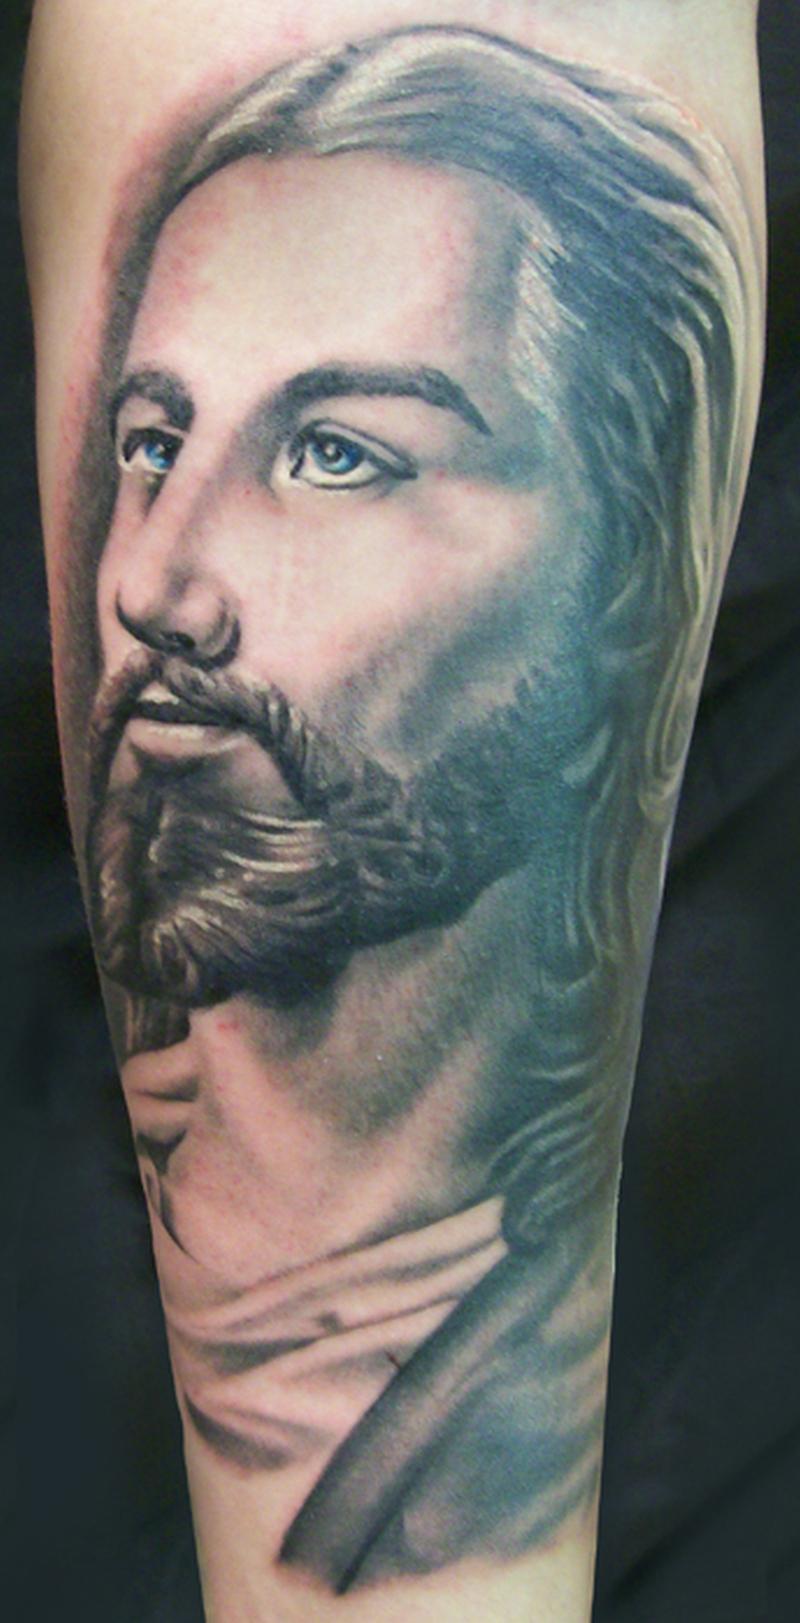 Black n grey ink jesus portrait tattoo design tattoos for Tattoos of black jesus